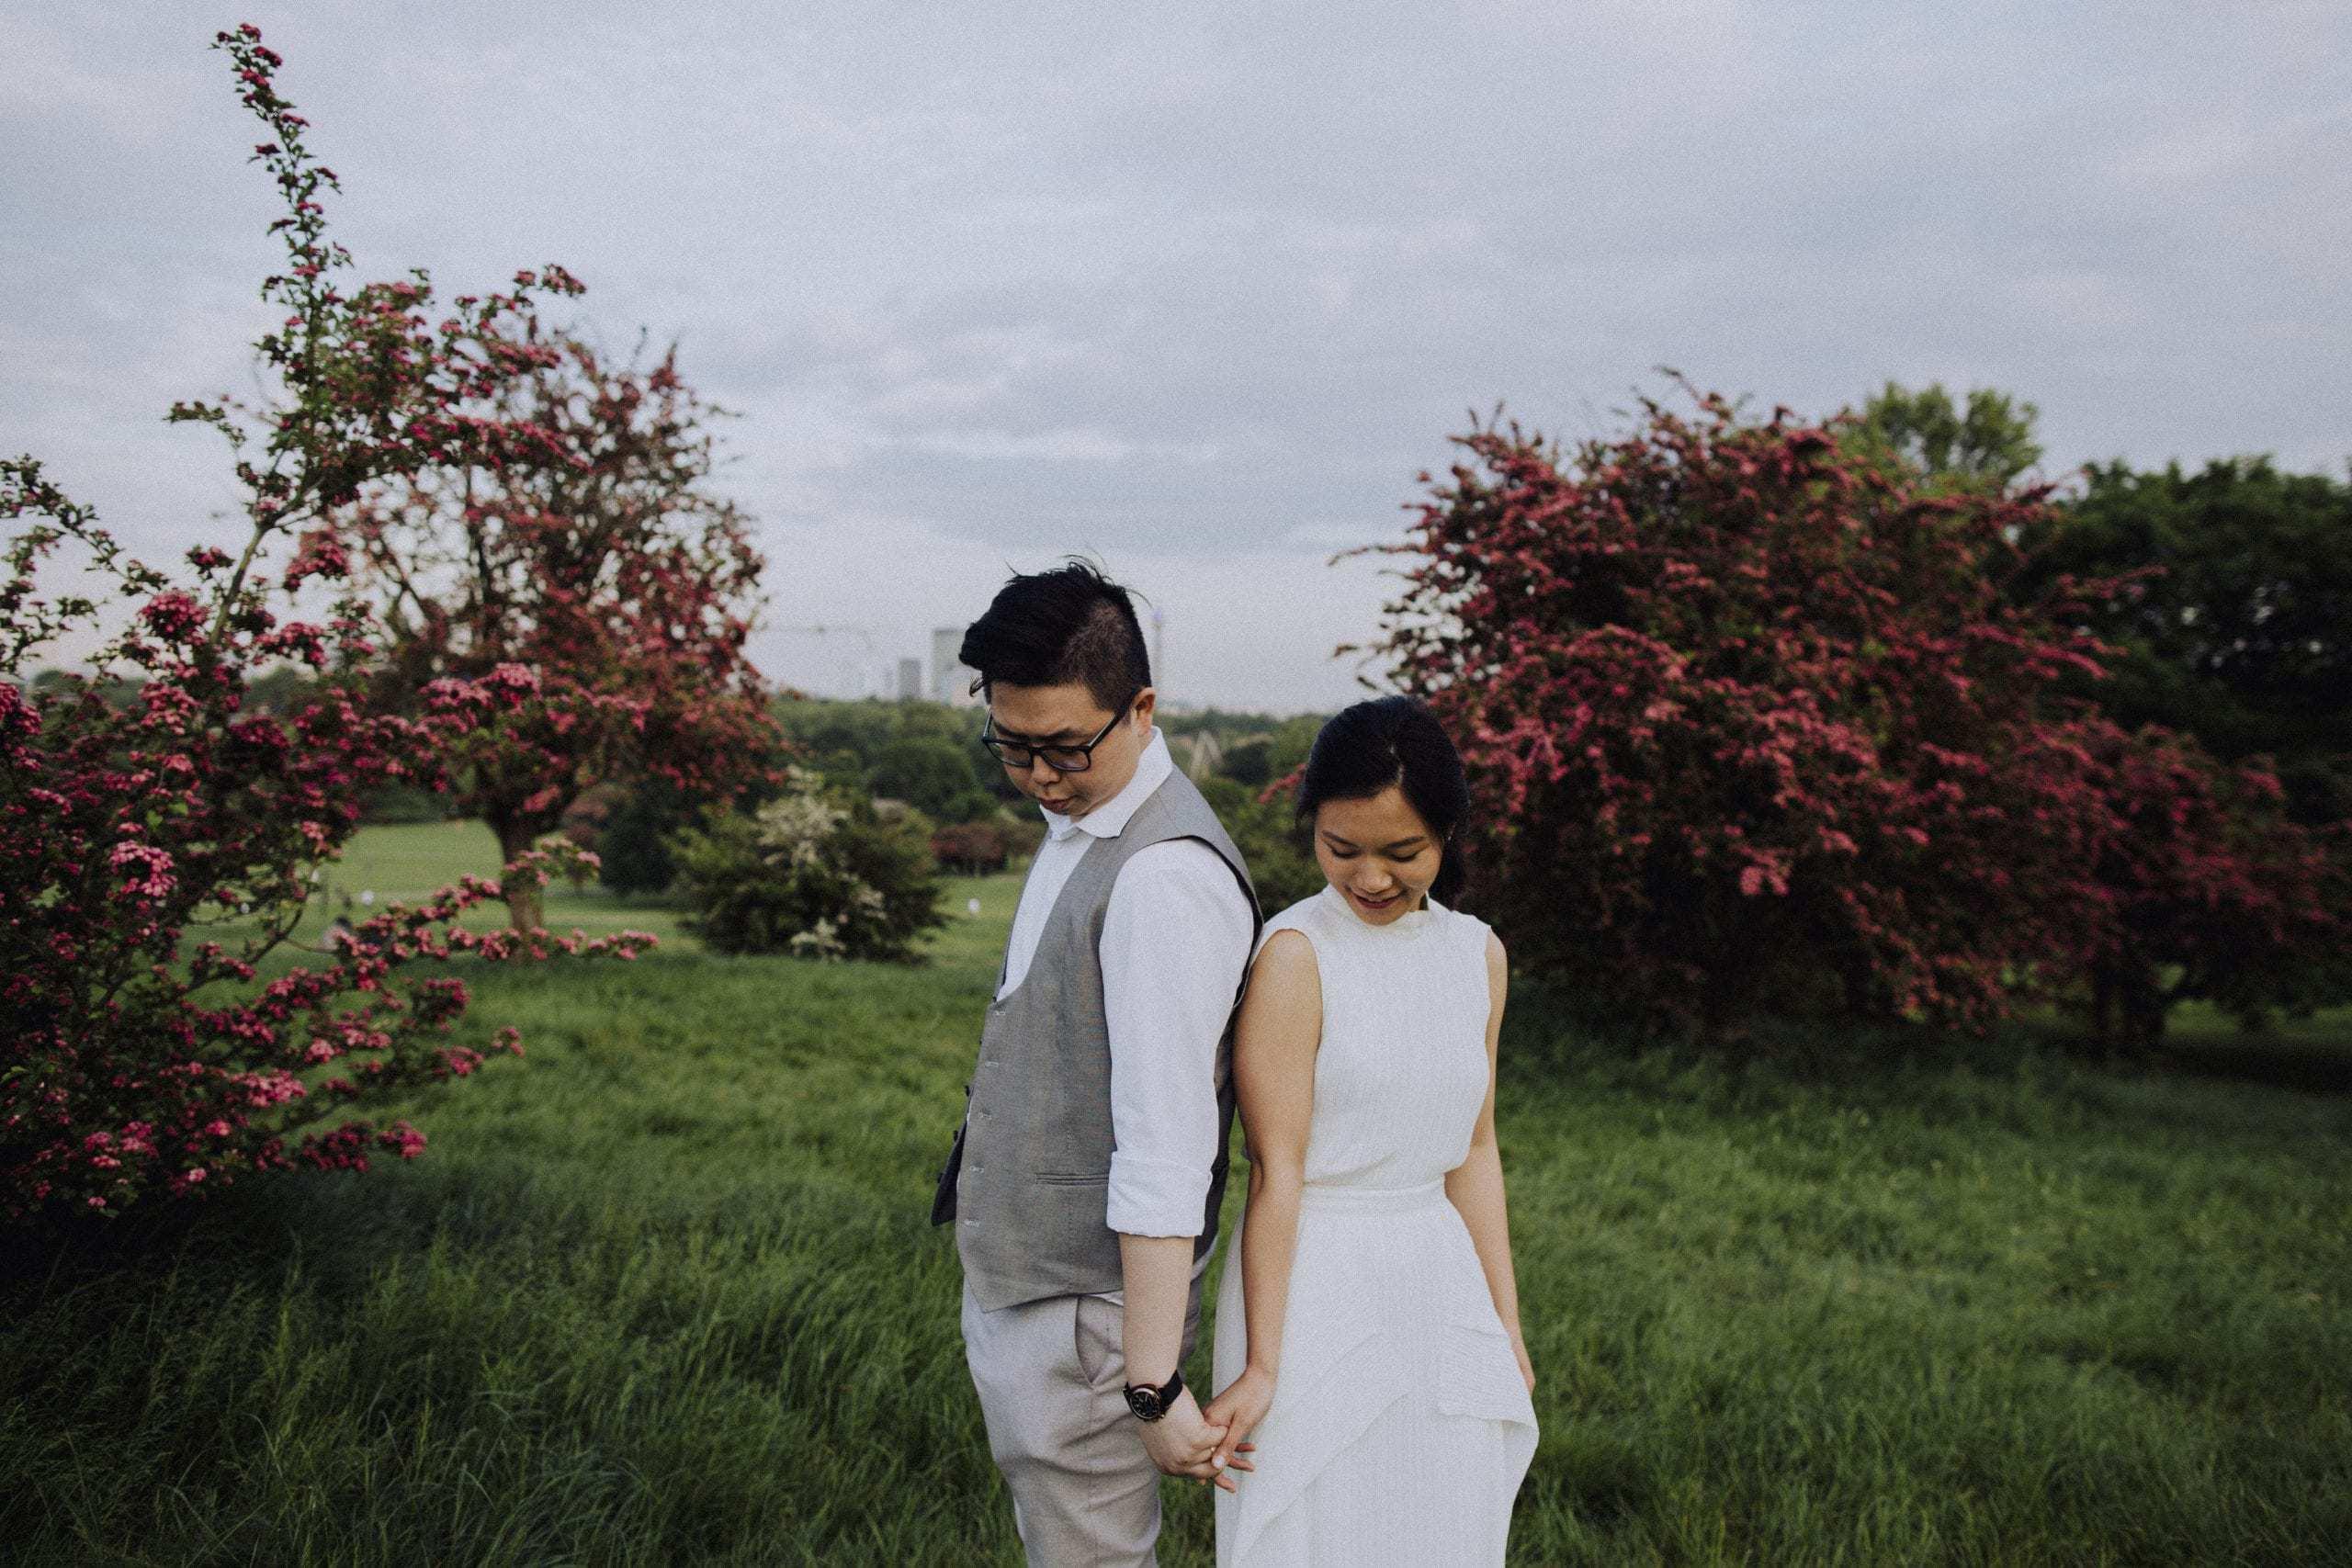 Wedding photo of couple at Primrose Hill in Lonon